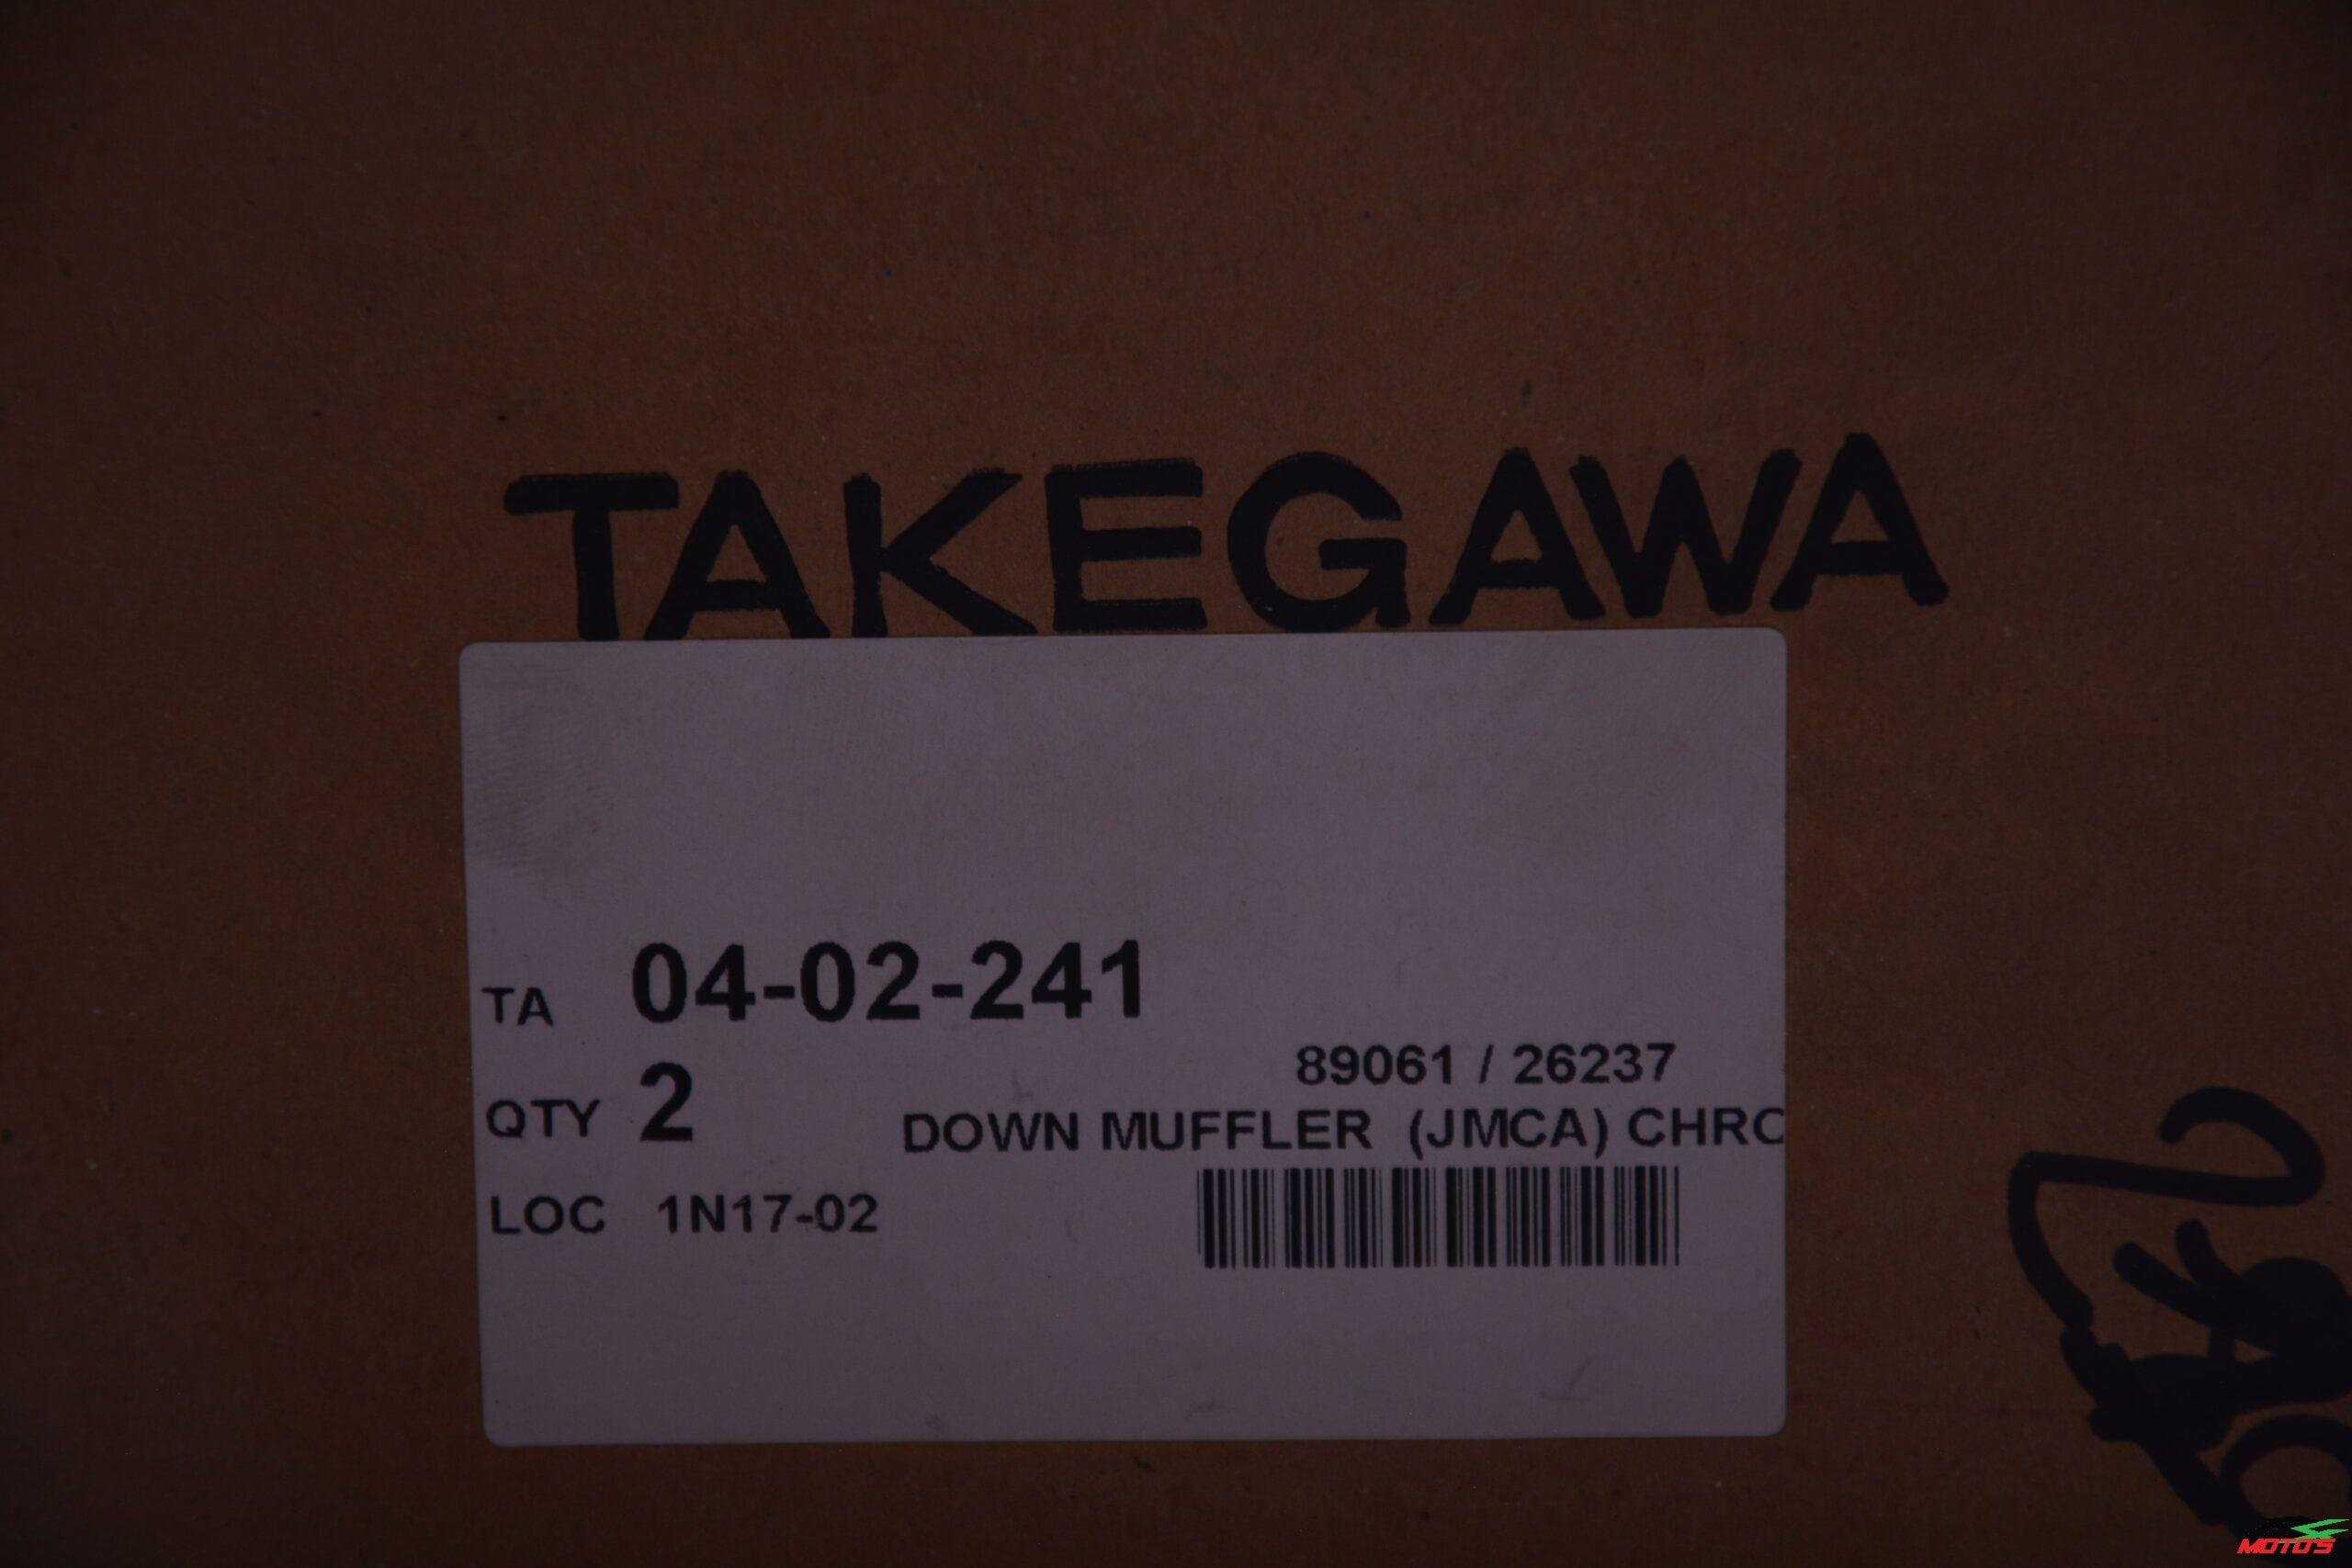 Takegawa down muffler chrome plated - 04-02-241